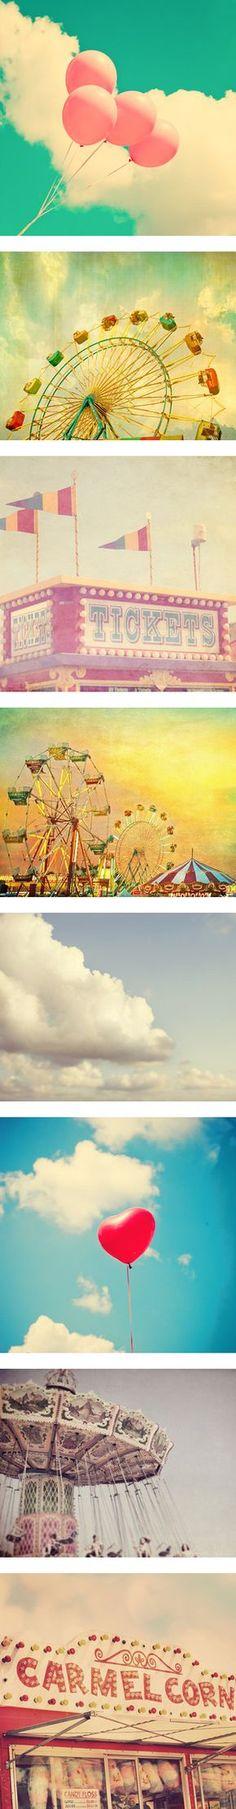 vintage carnival pictures